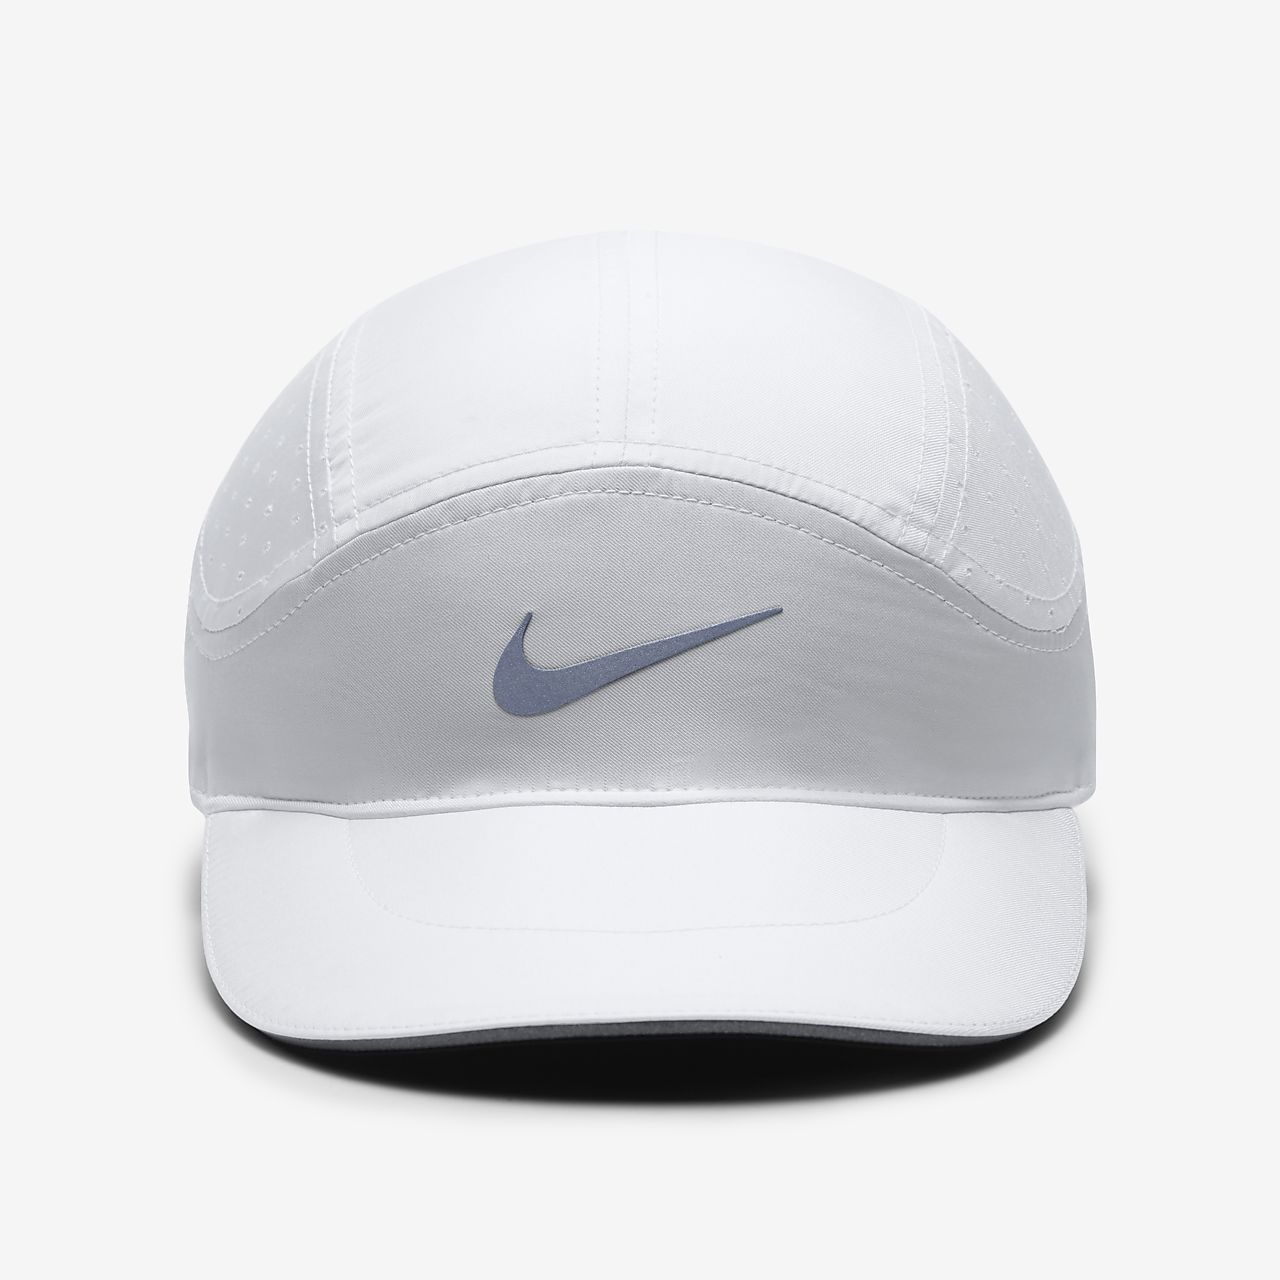 846dde5a6e2 Nike AeroBill Running Hat. Nike.com IN